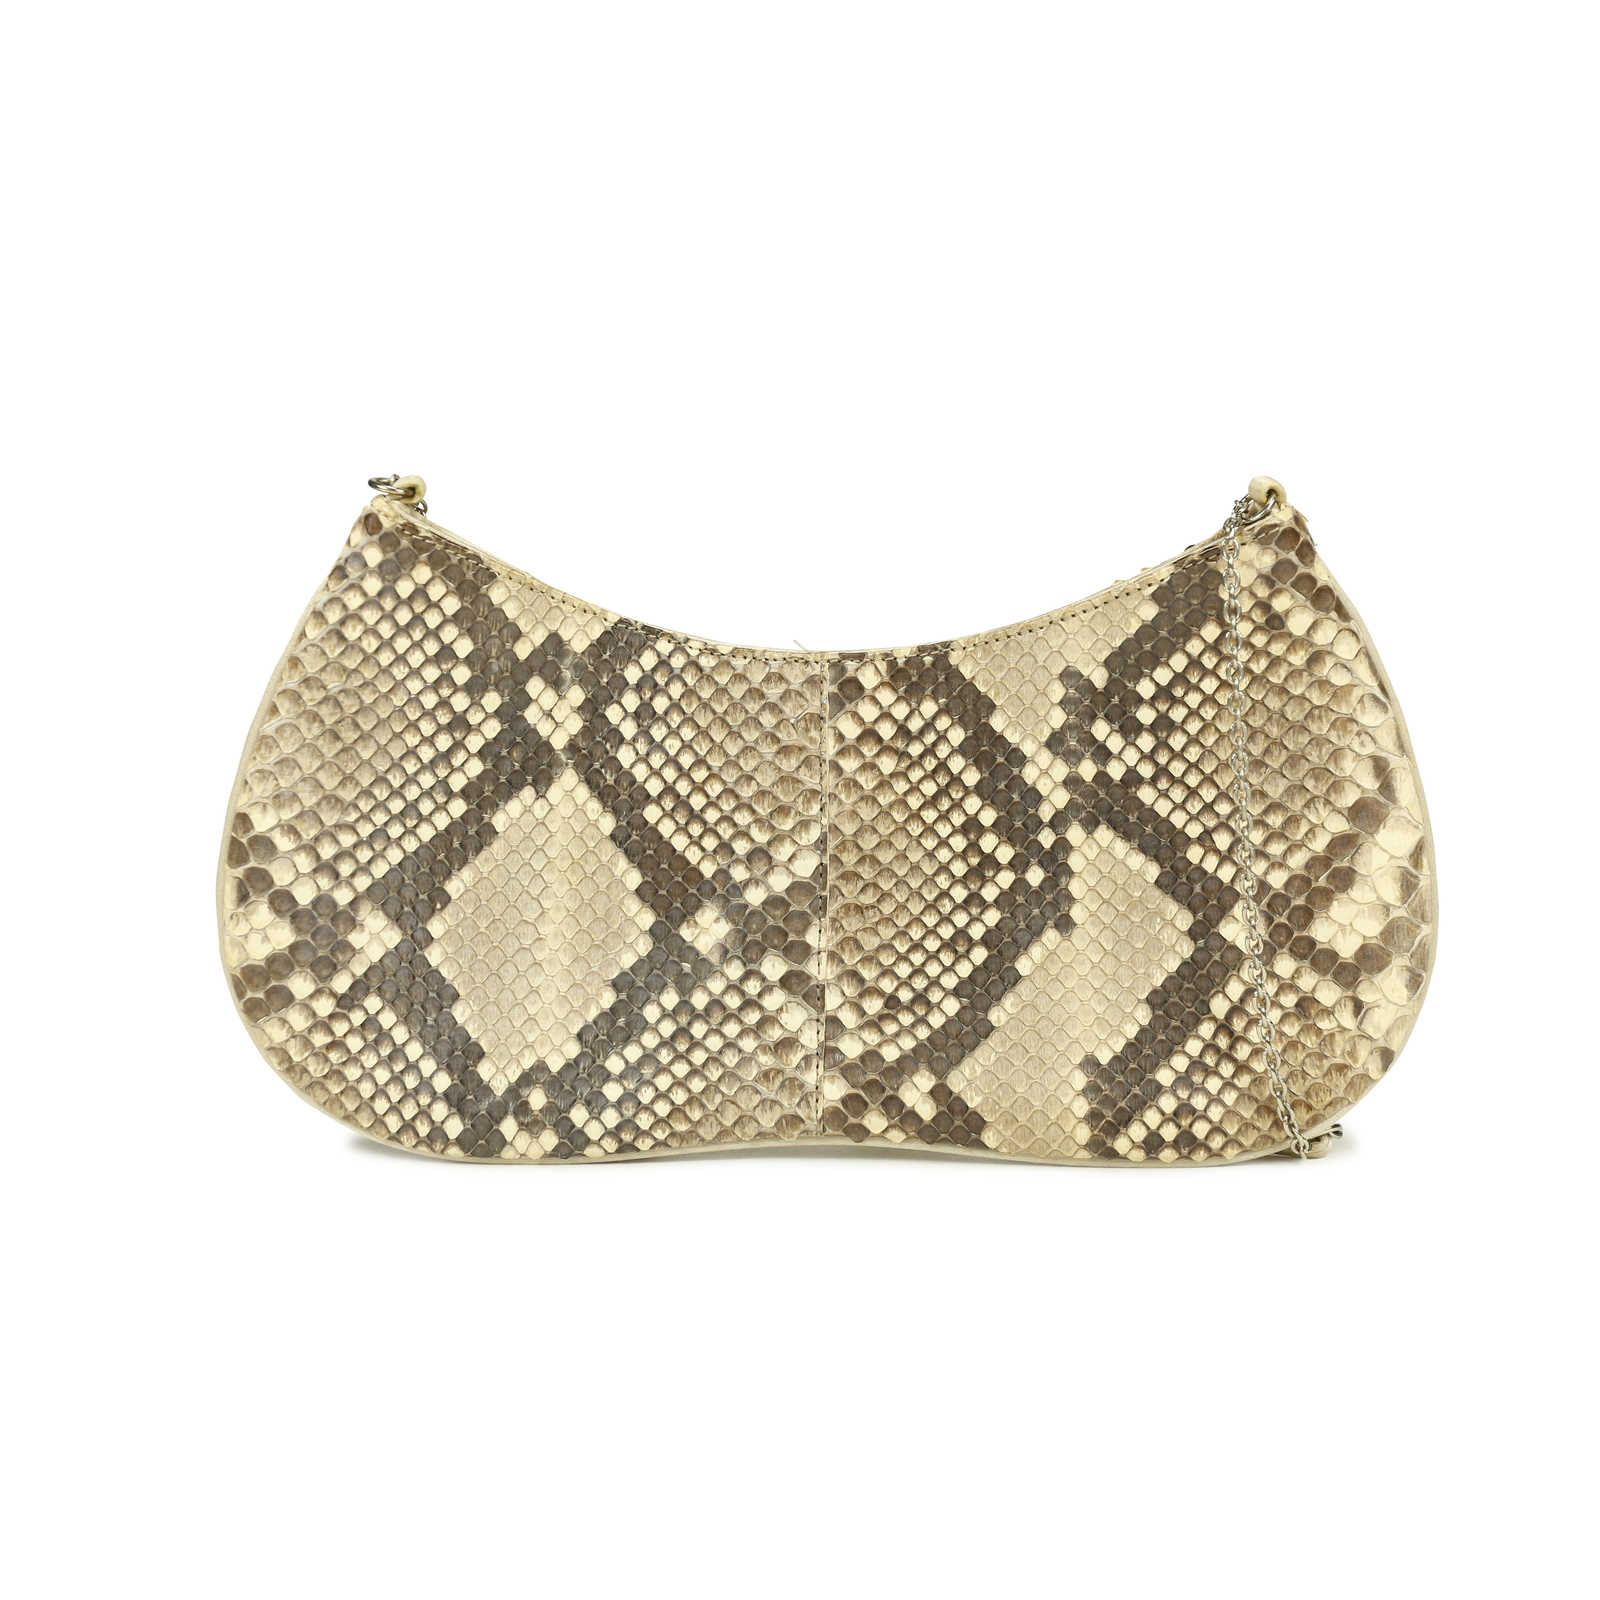 47197e75c467 ... Authentic Second Hand Prada Snakeskin Handbag (PSS-169-00009) -  Thumbnail 1 ...